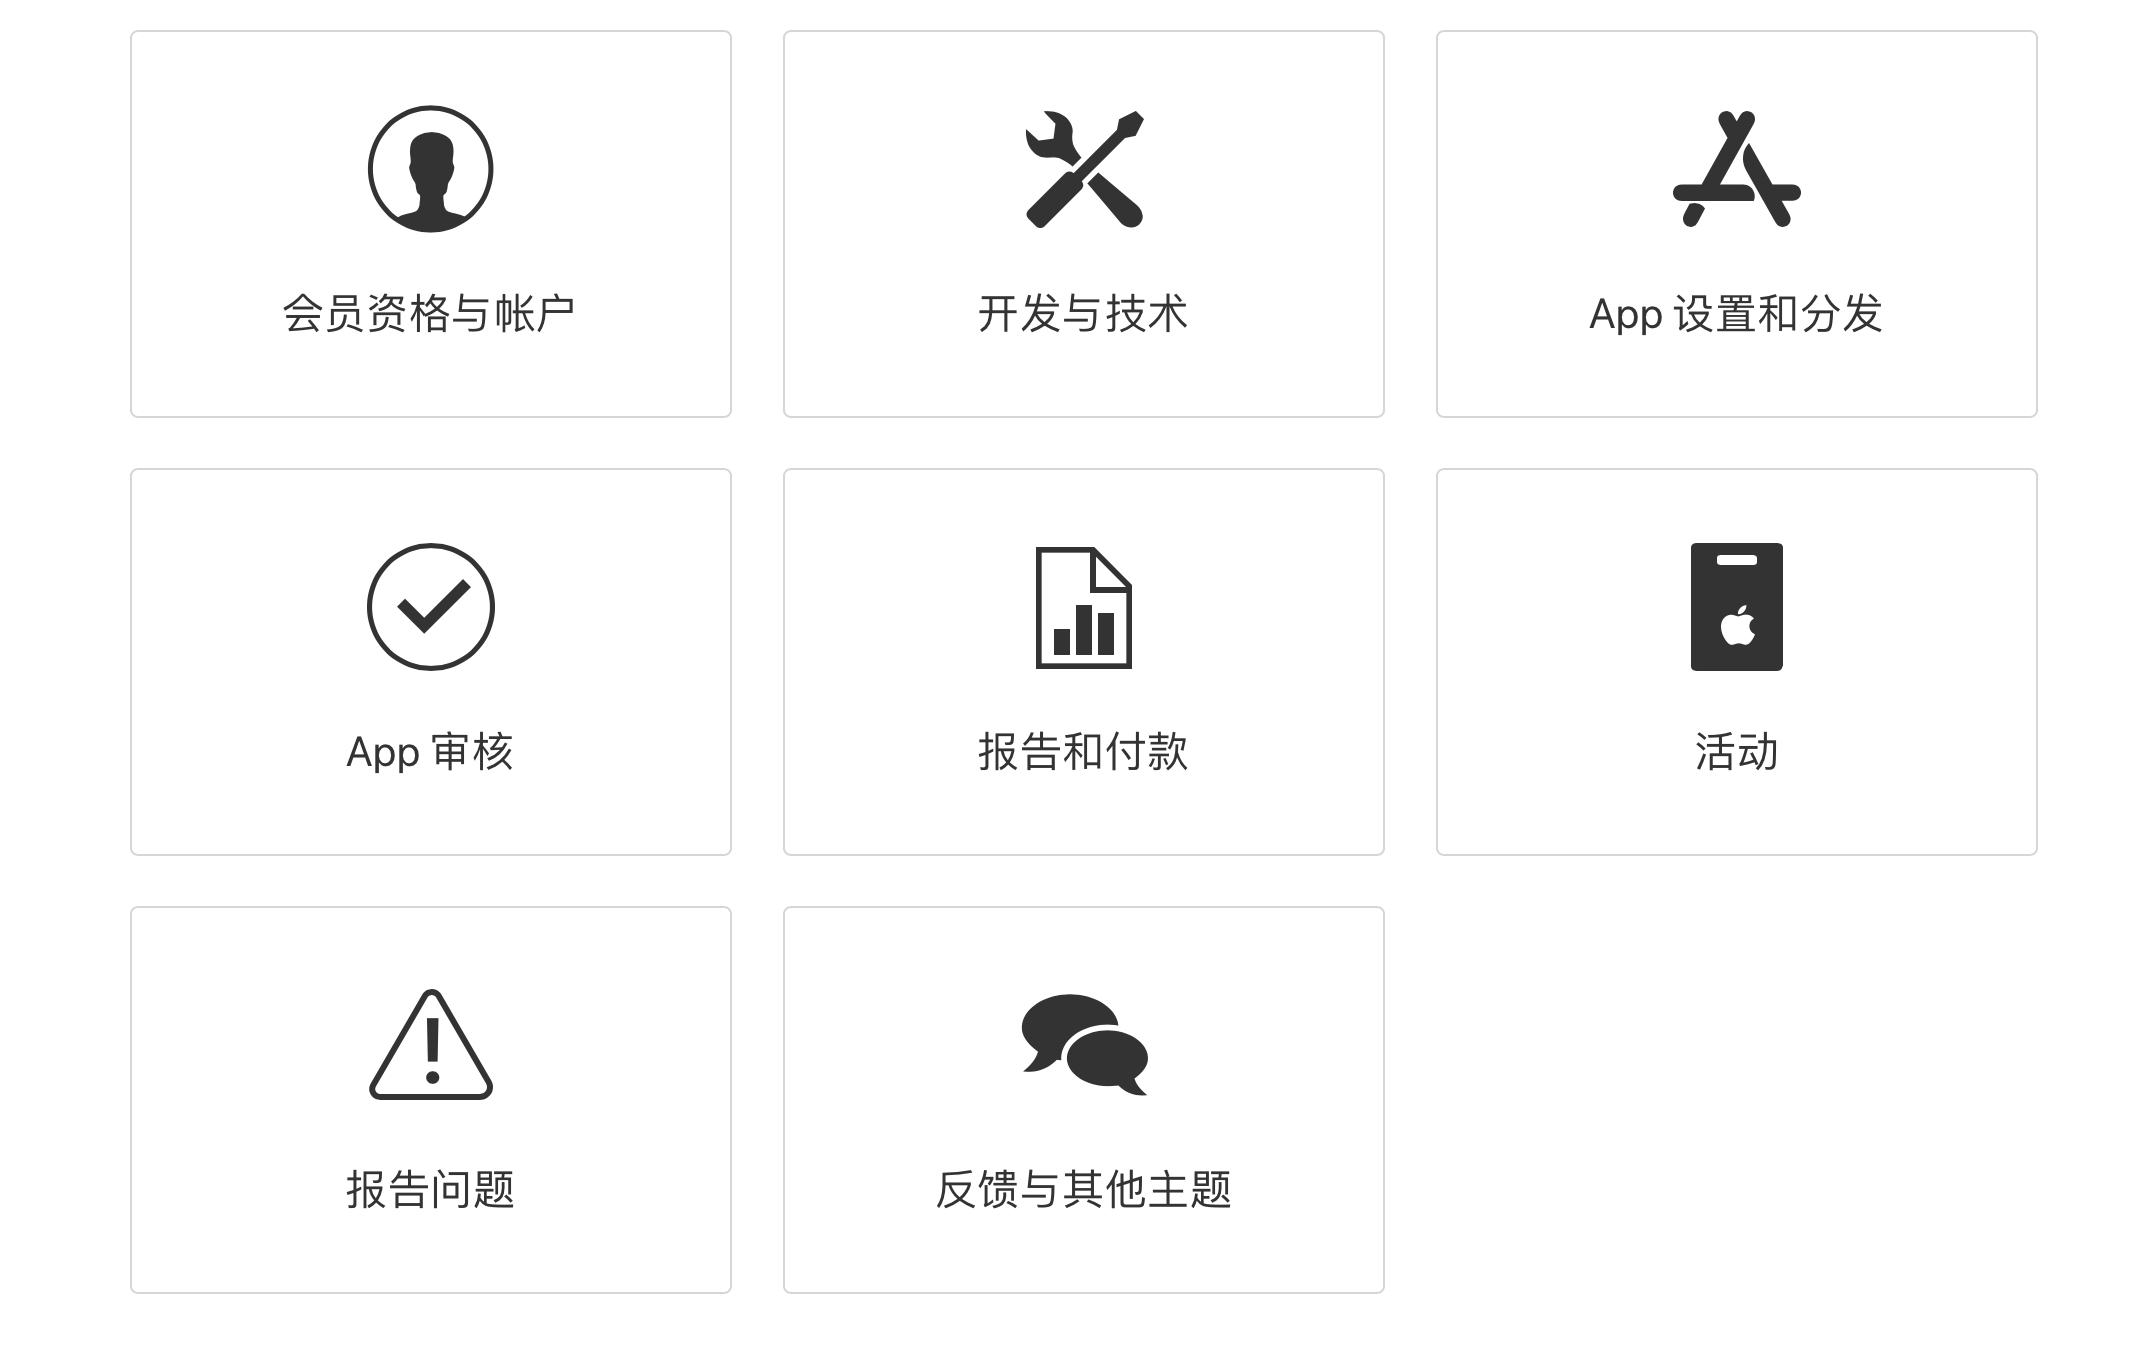 20180420-developer-apple-contact.png